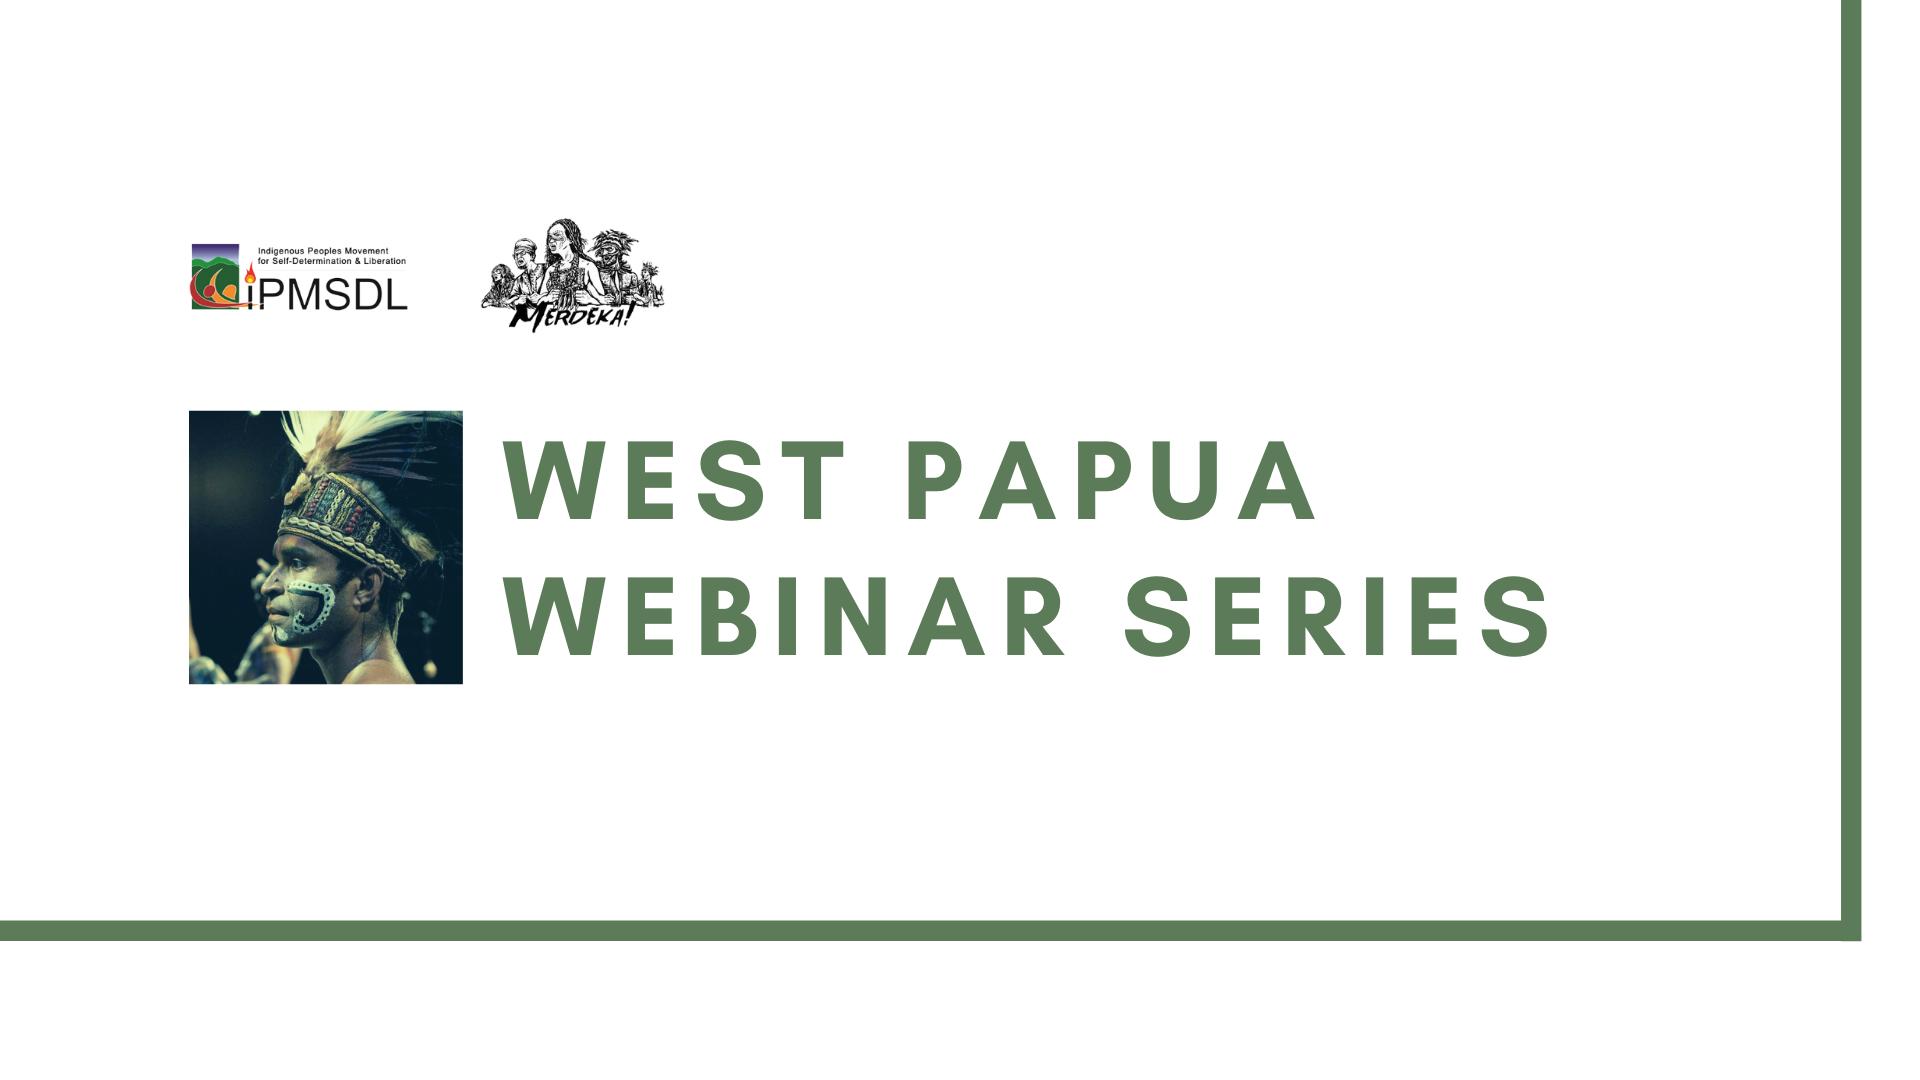 West Papua Webinar Series